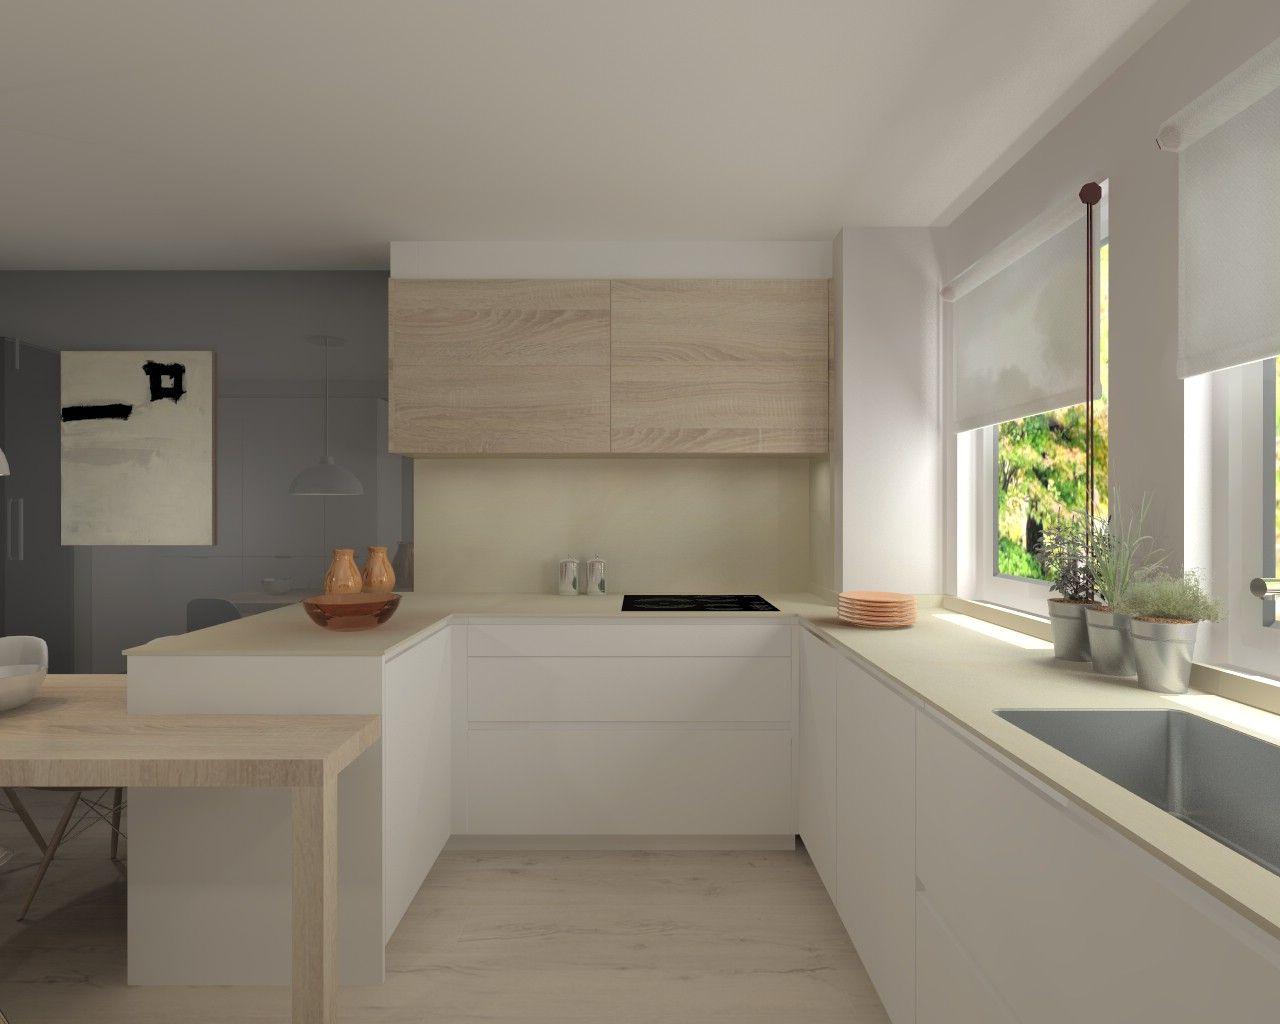 Proyectos de cocina en madrid cocinas pinterest for Cocinas en l modernas